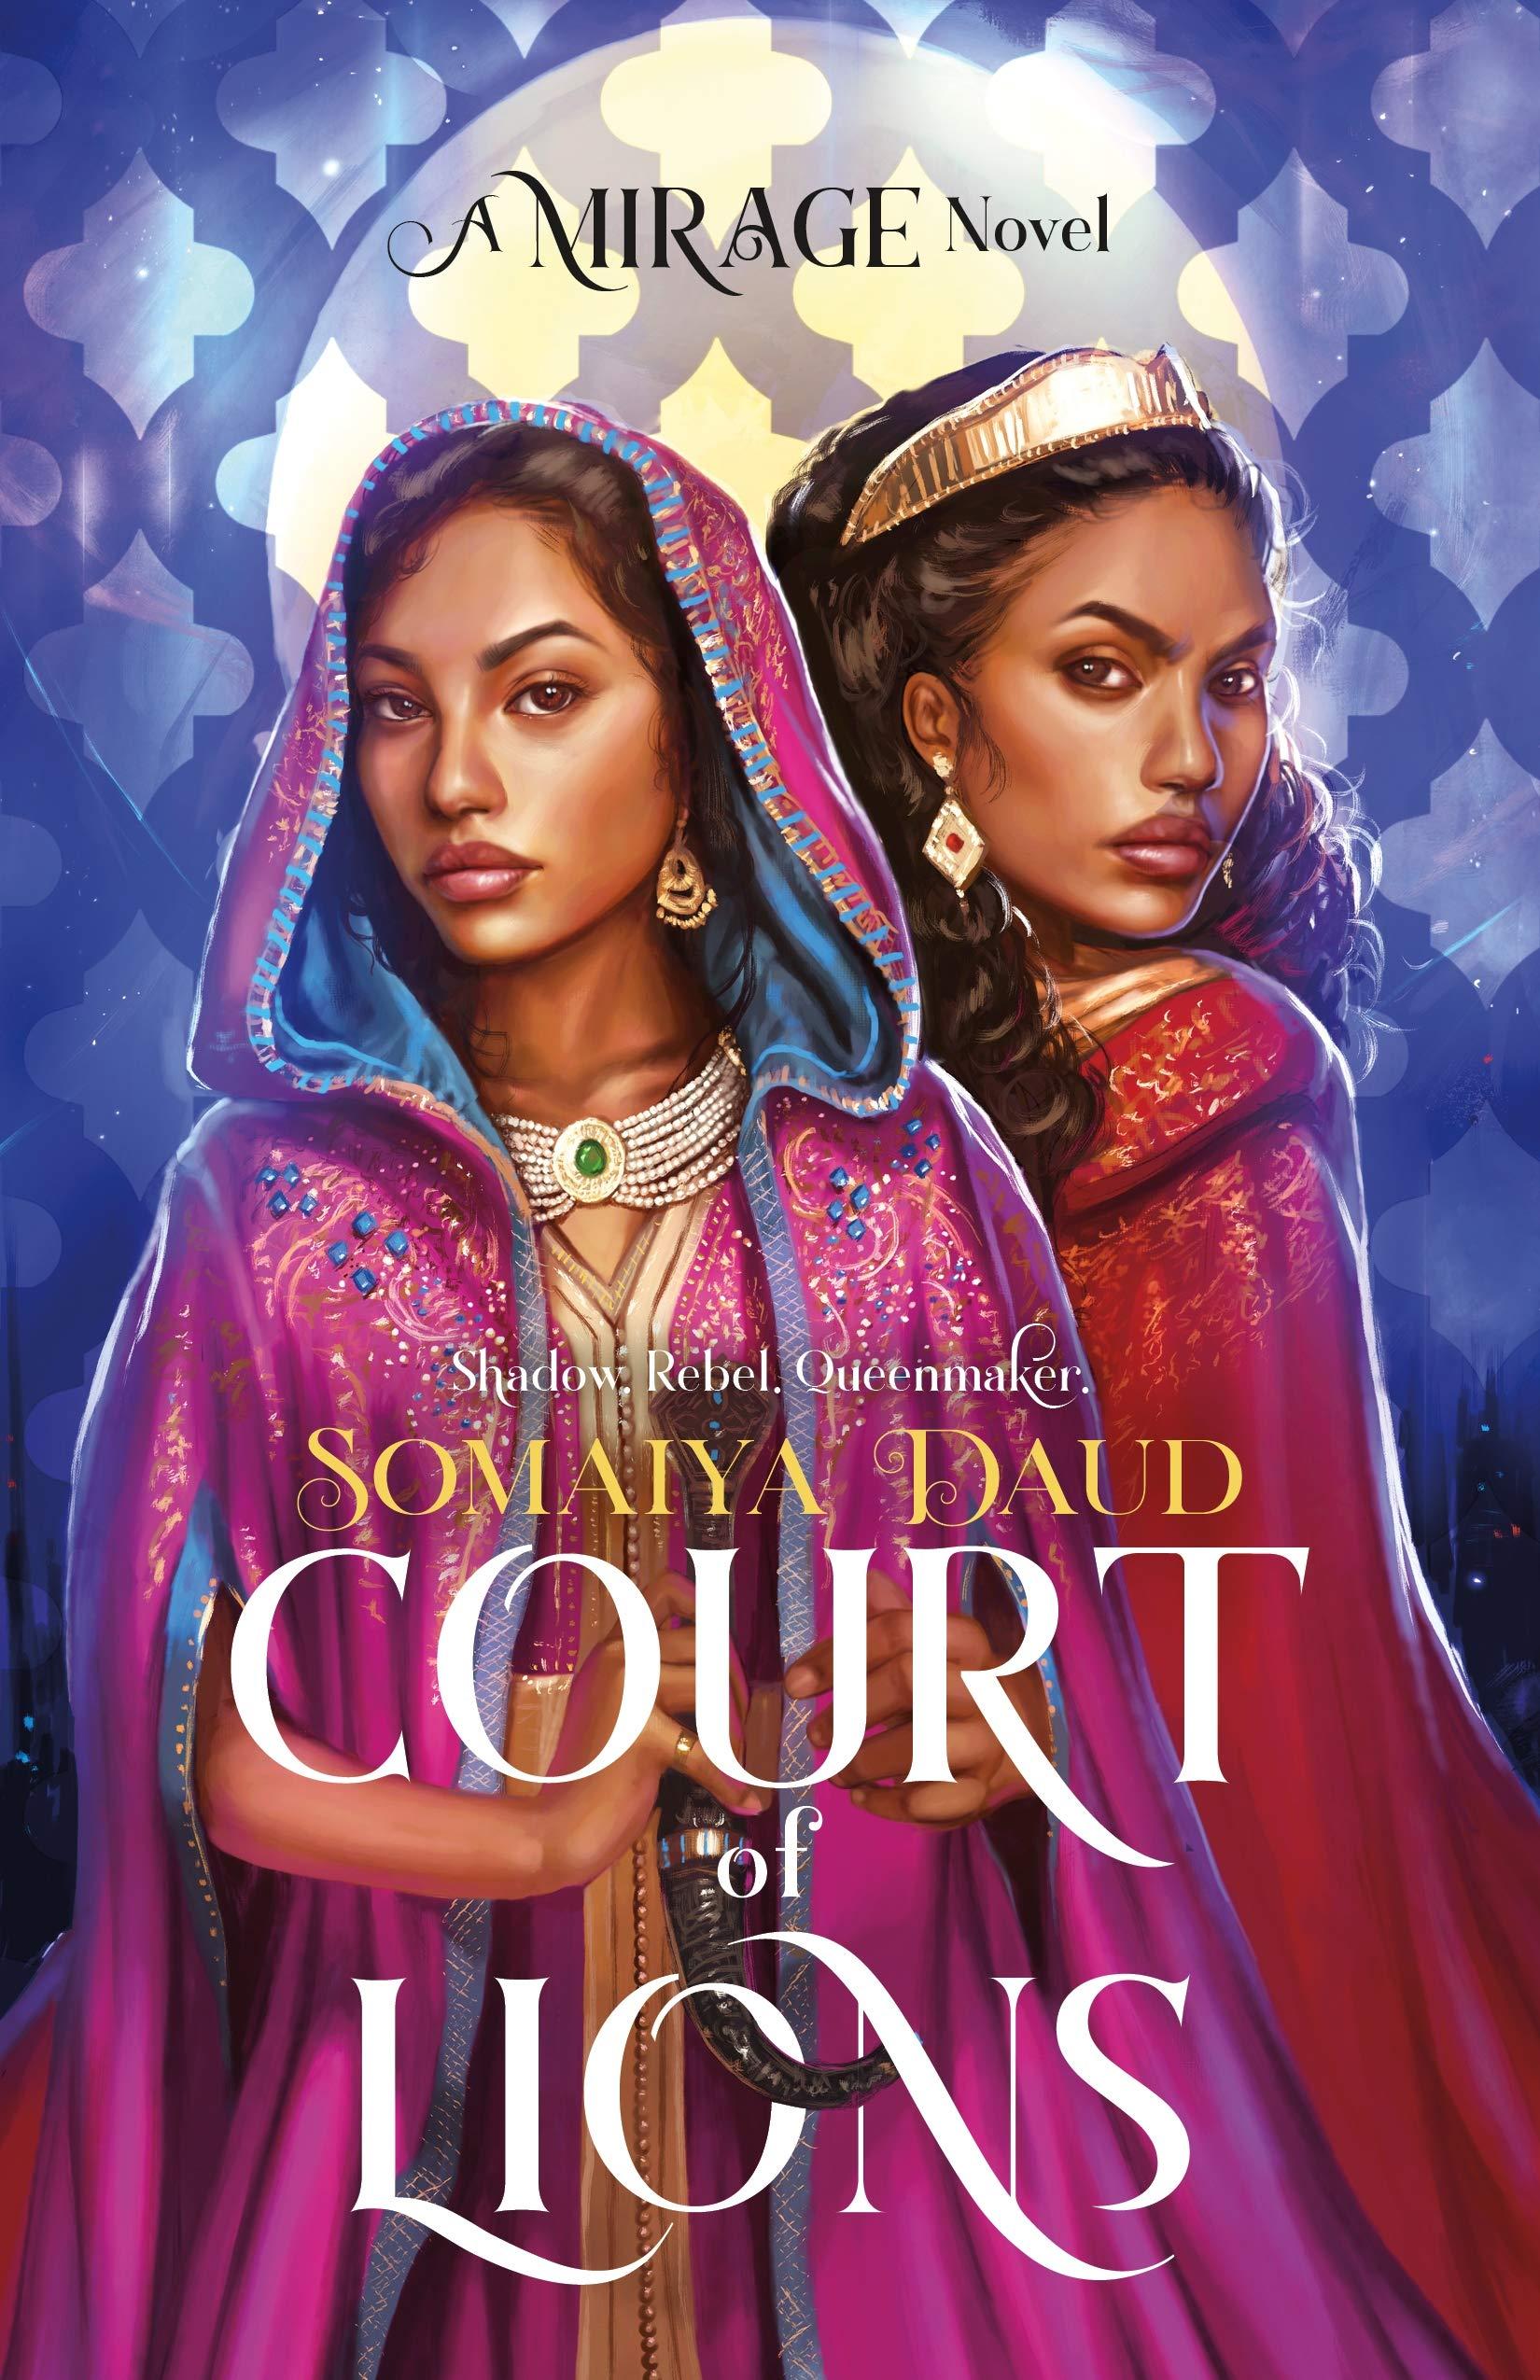 Court of Lions: A Mirage Novel: Amazon.ca: Daud, Somaiya: Books